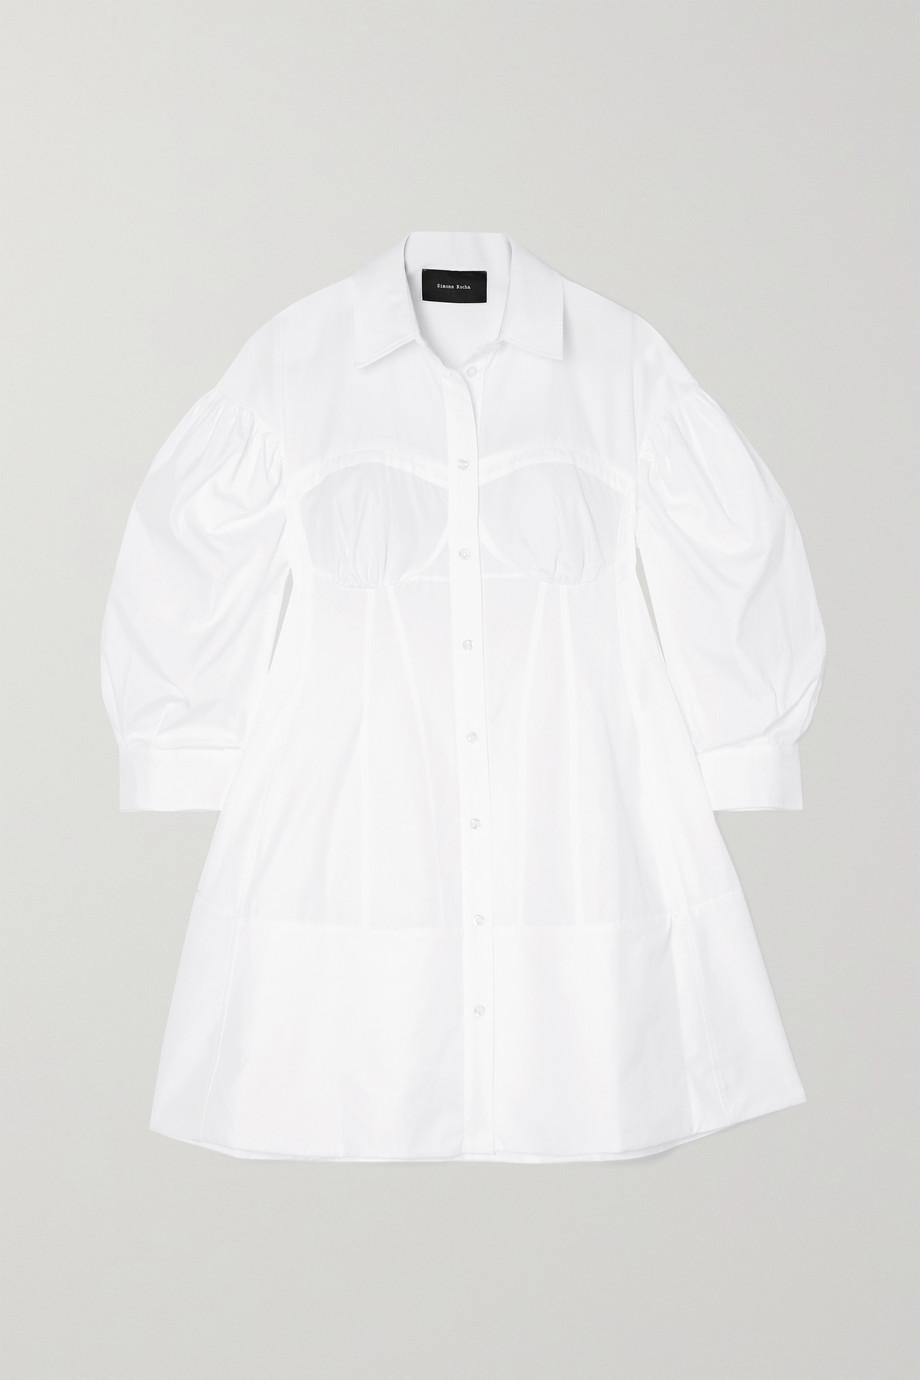 Simone Rocha Corset cotton-poplin mini shirt dress